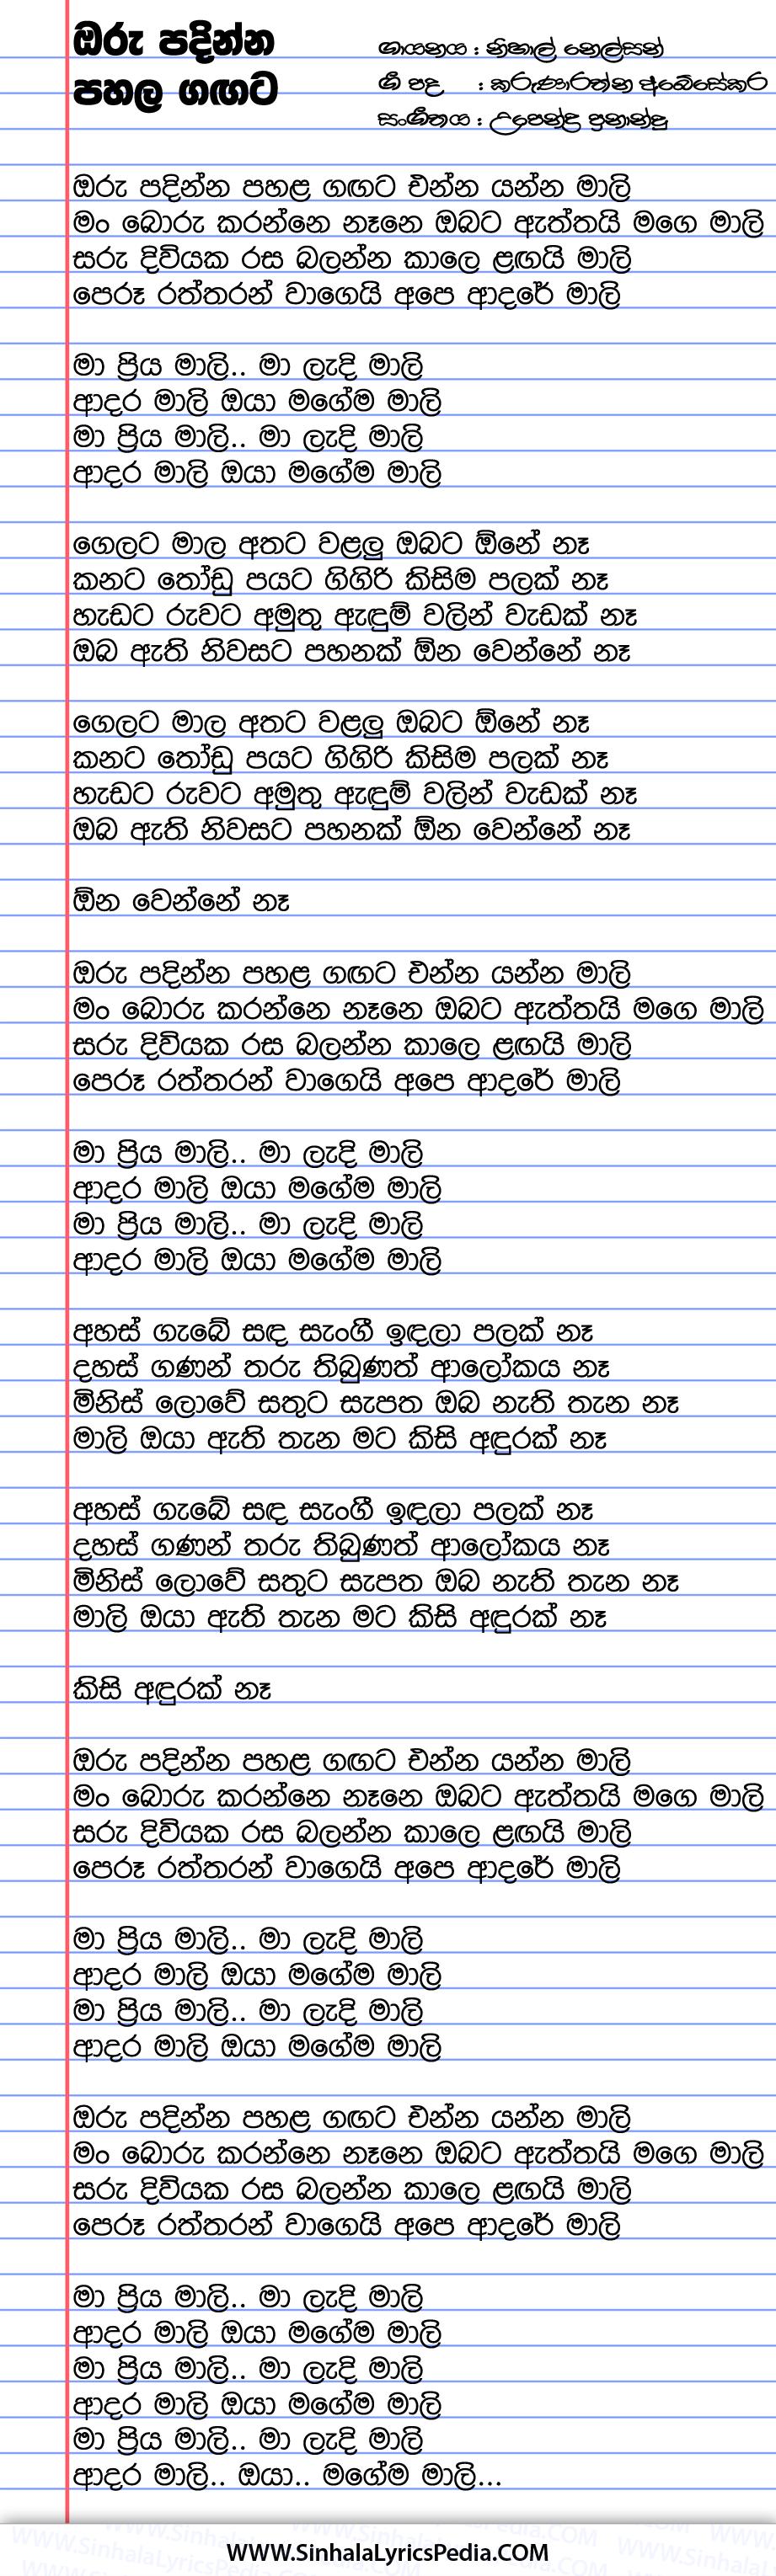 Oru Padinna Pahala Gangata Song Lyrics